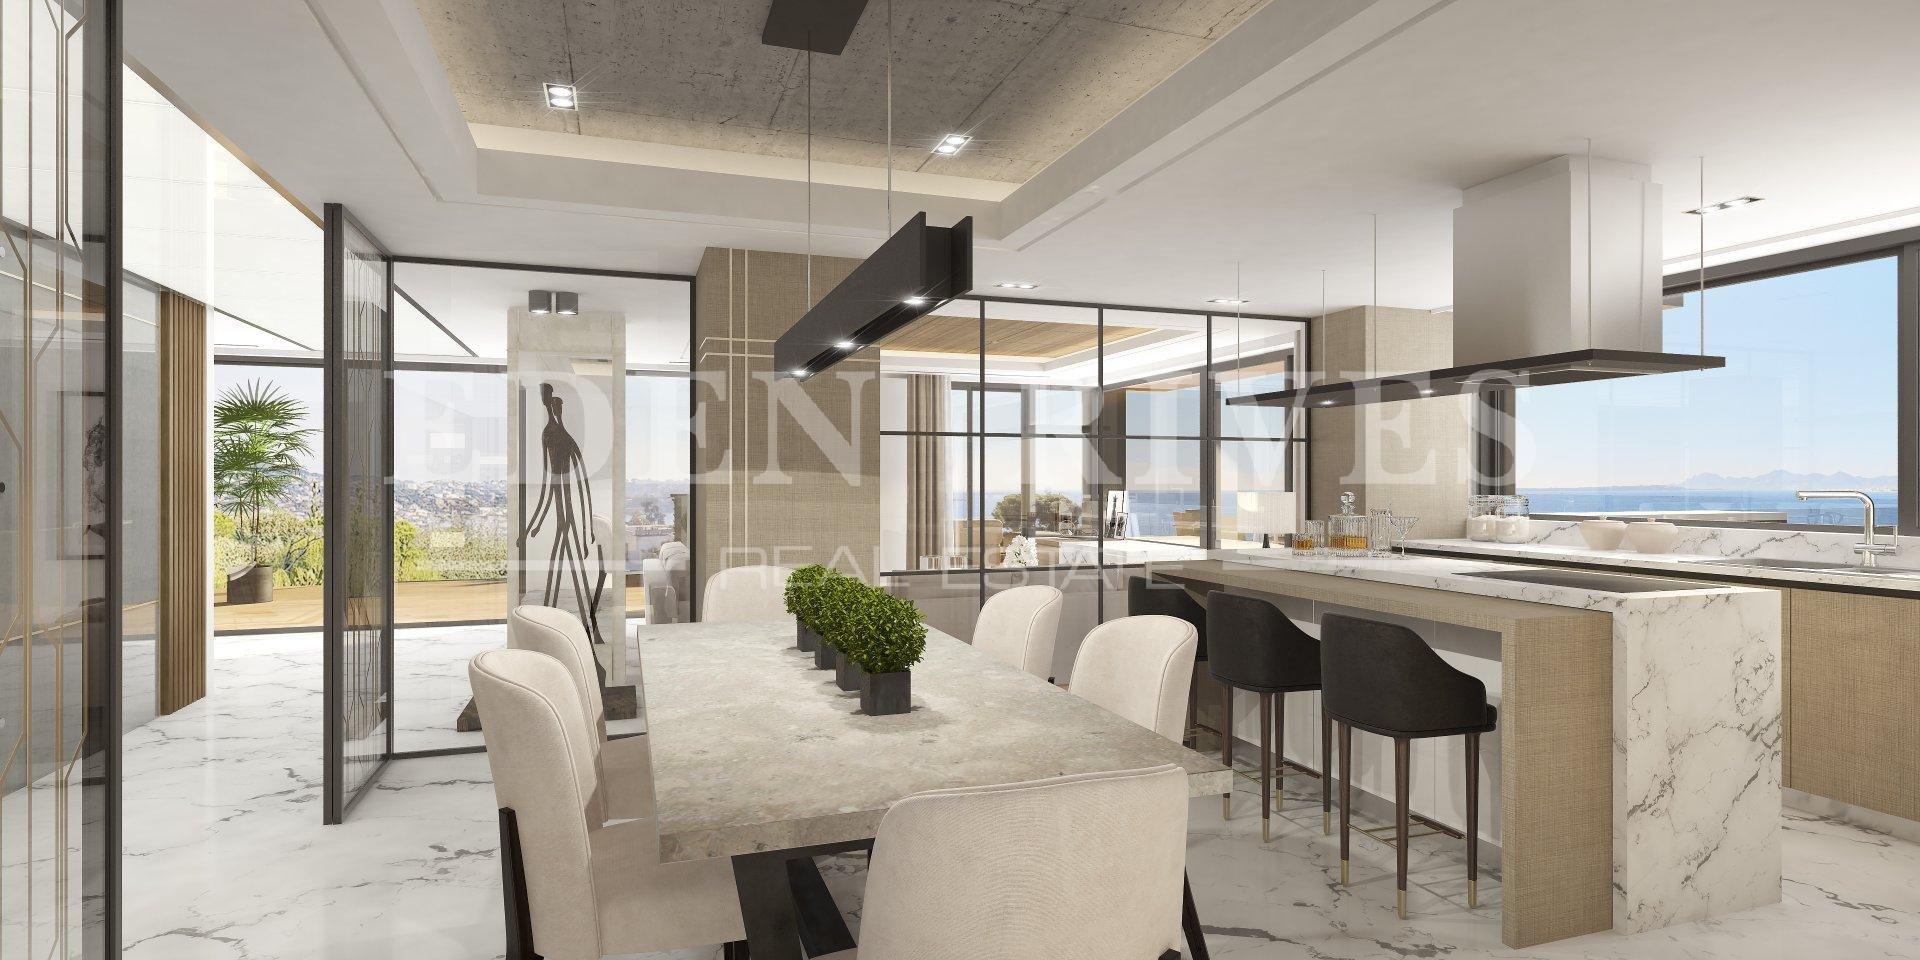 Stainless steel, natural light, kitchen bar